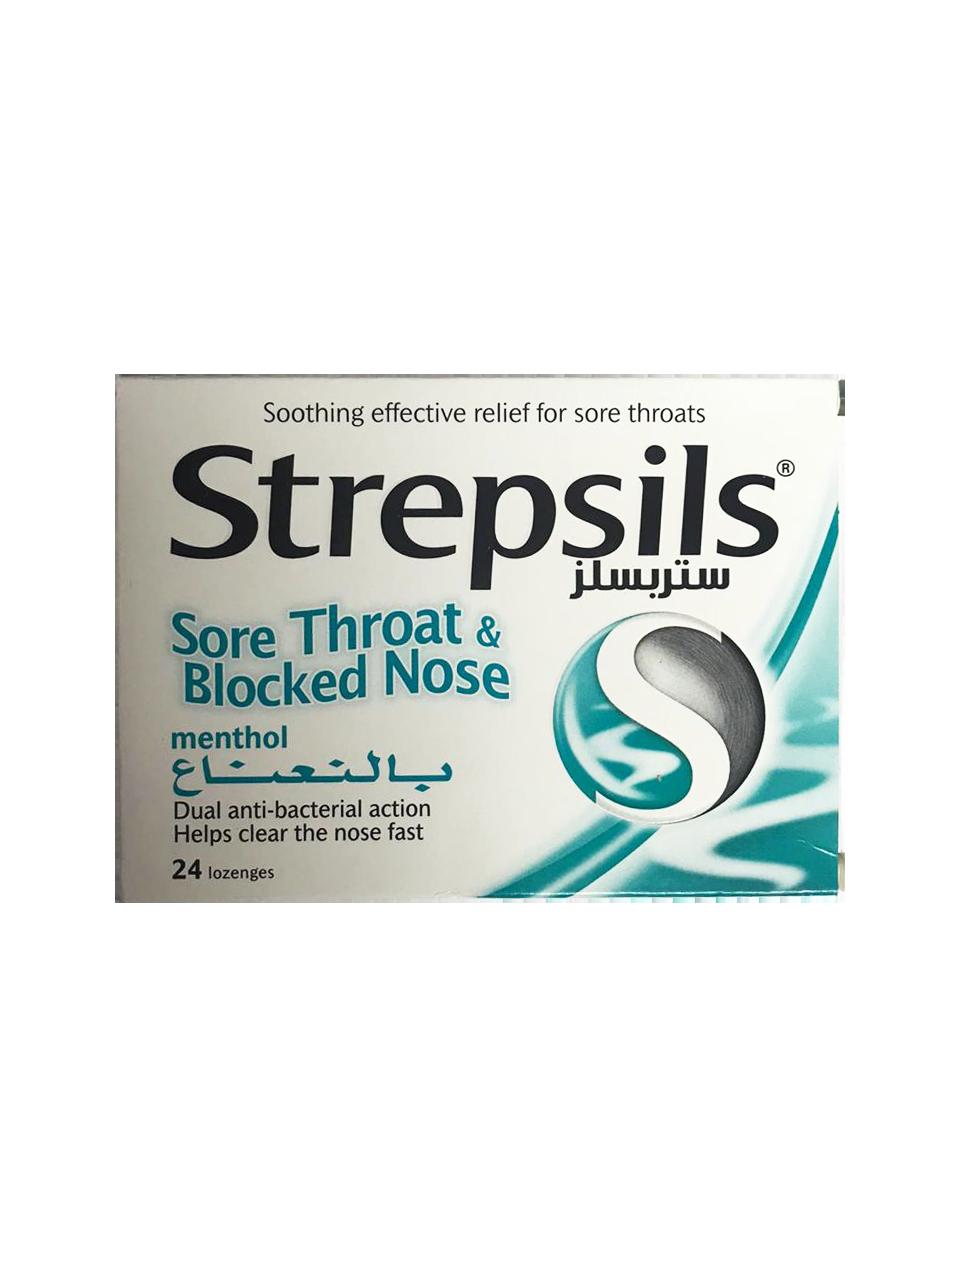 Strepsils Sore Throat Blocked Nose Menthol Candy 24pc